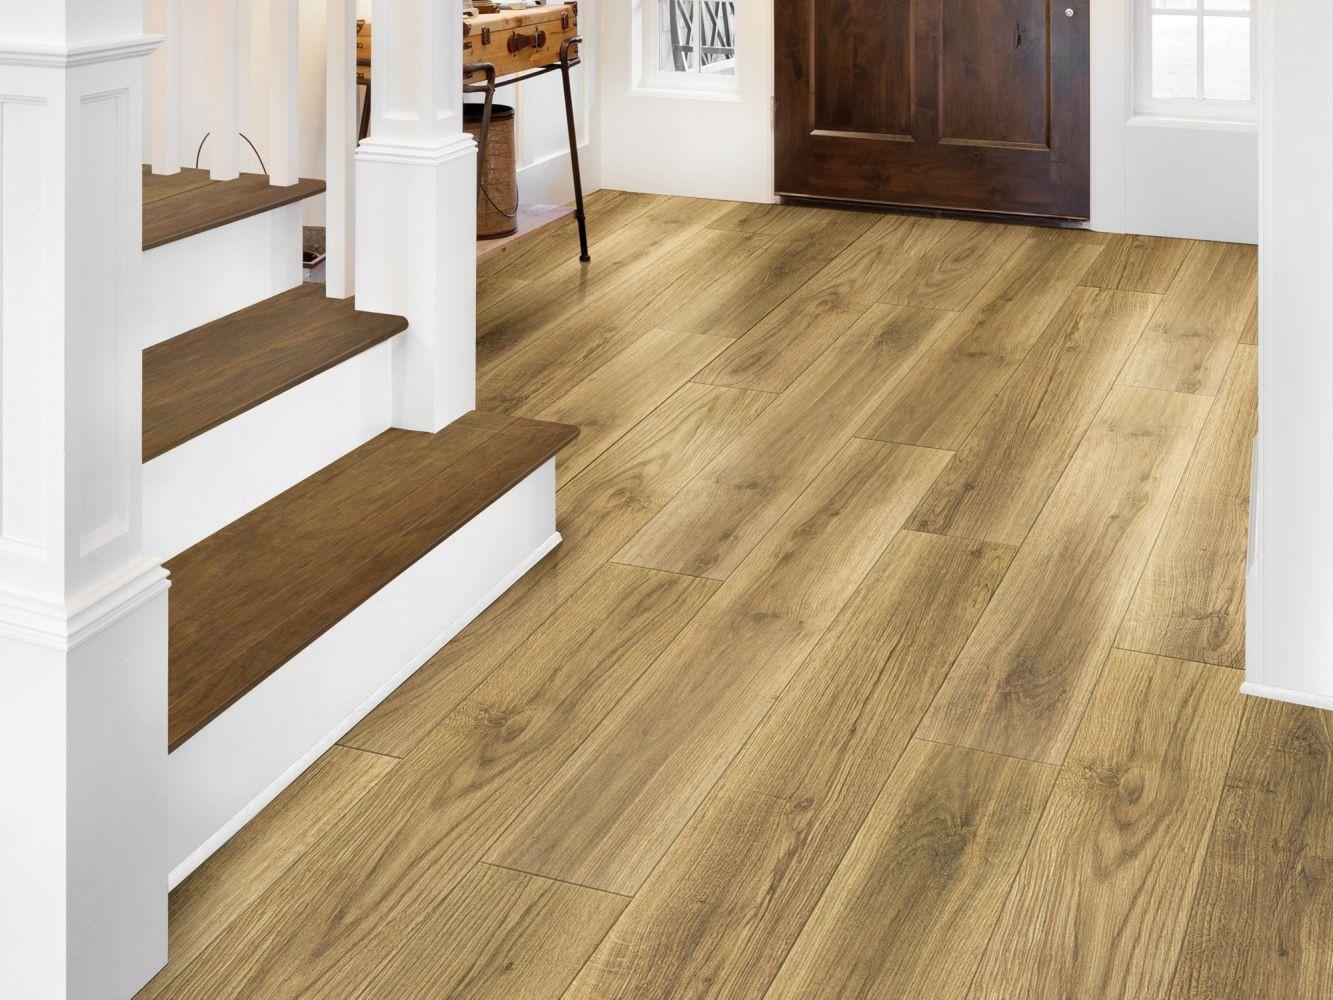 Shaw Floors Resilient Residential Tivoli Plus Tesora 07057_0845V